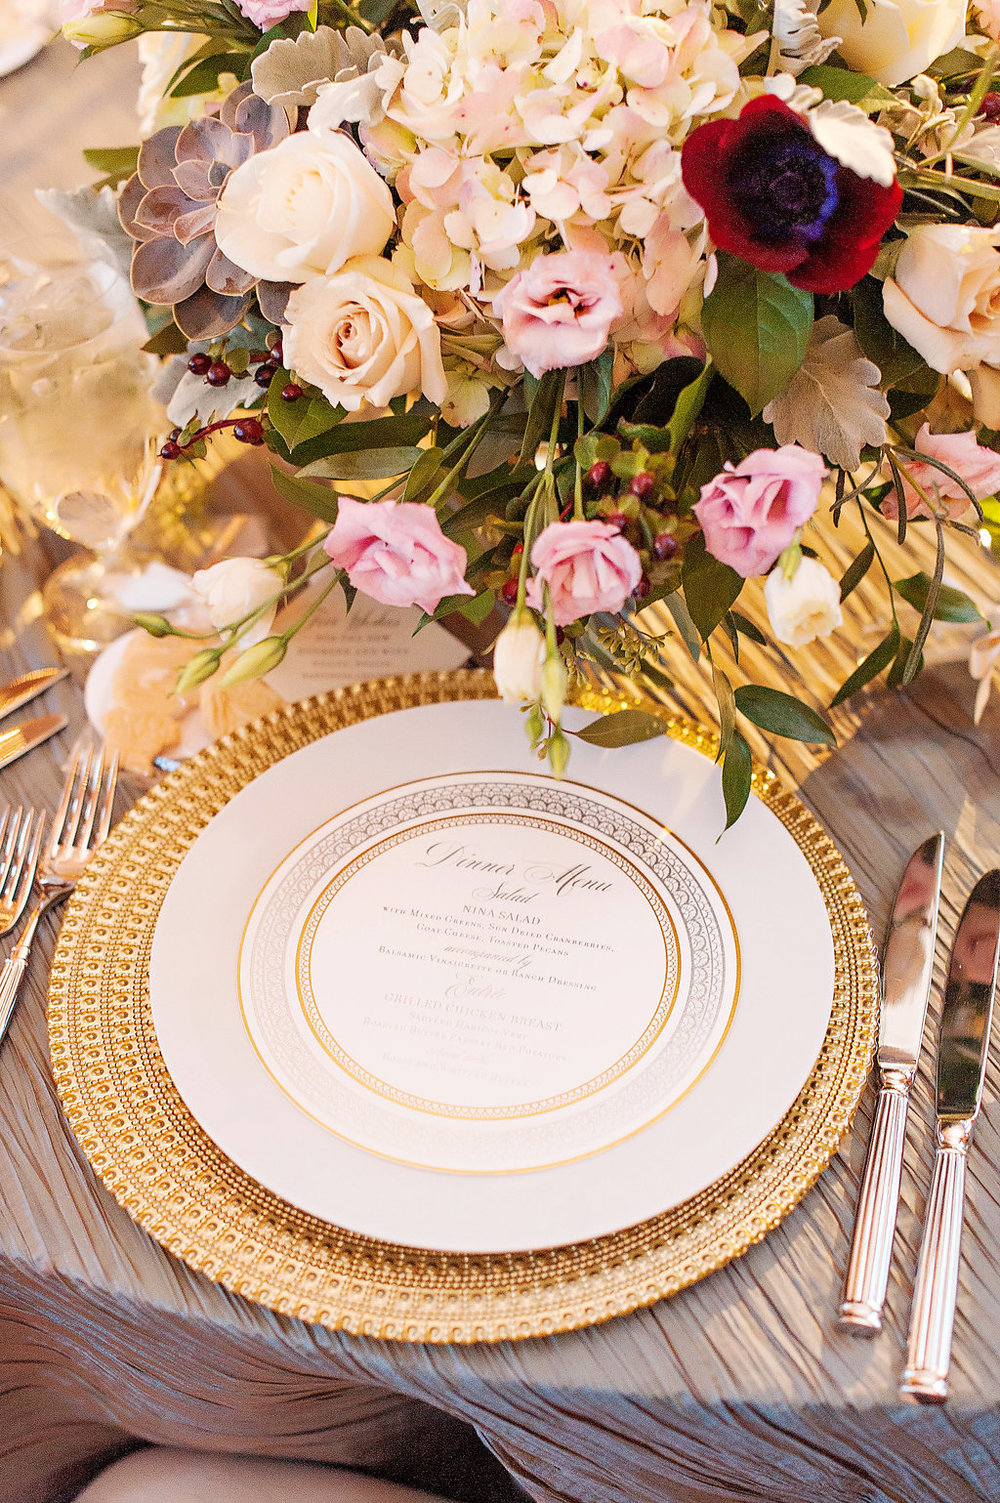 Kortnee Kate Photography   Custom circle wedding dinner menu by Poeme